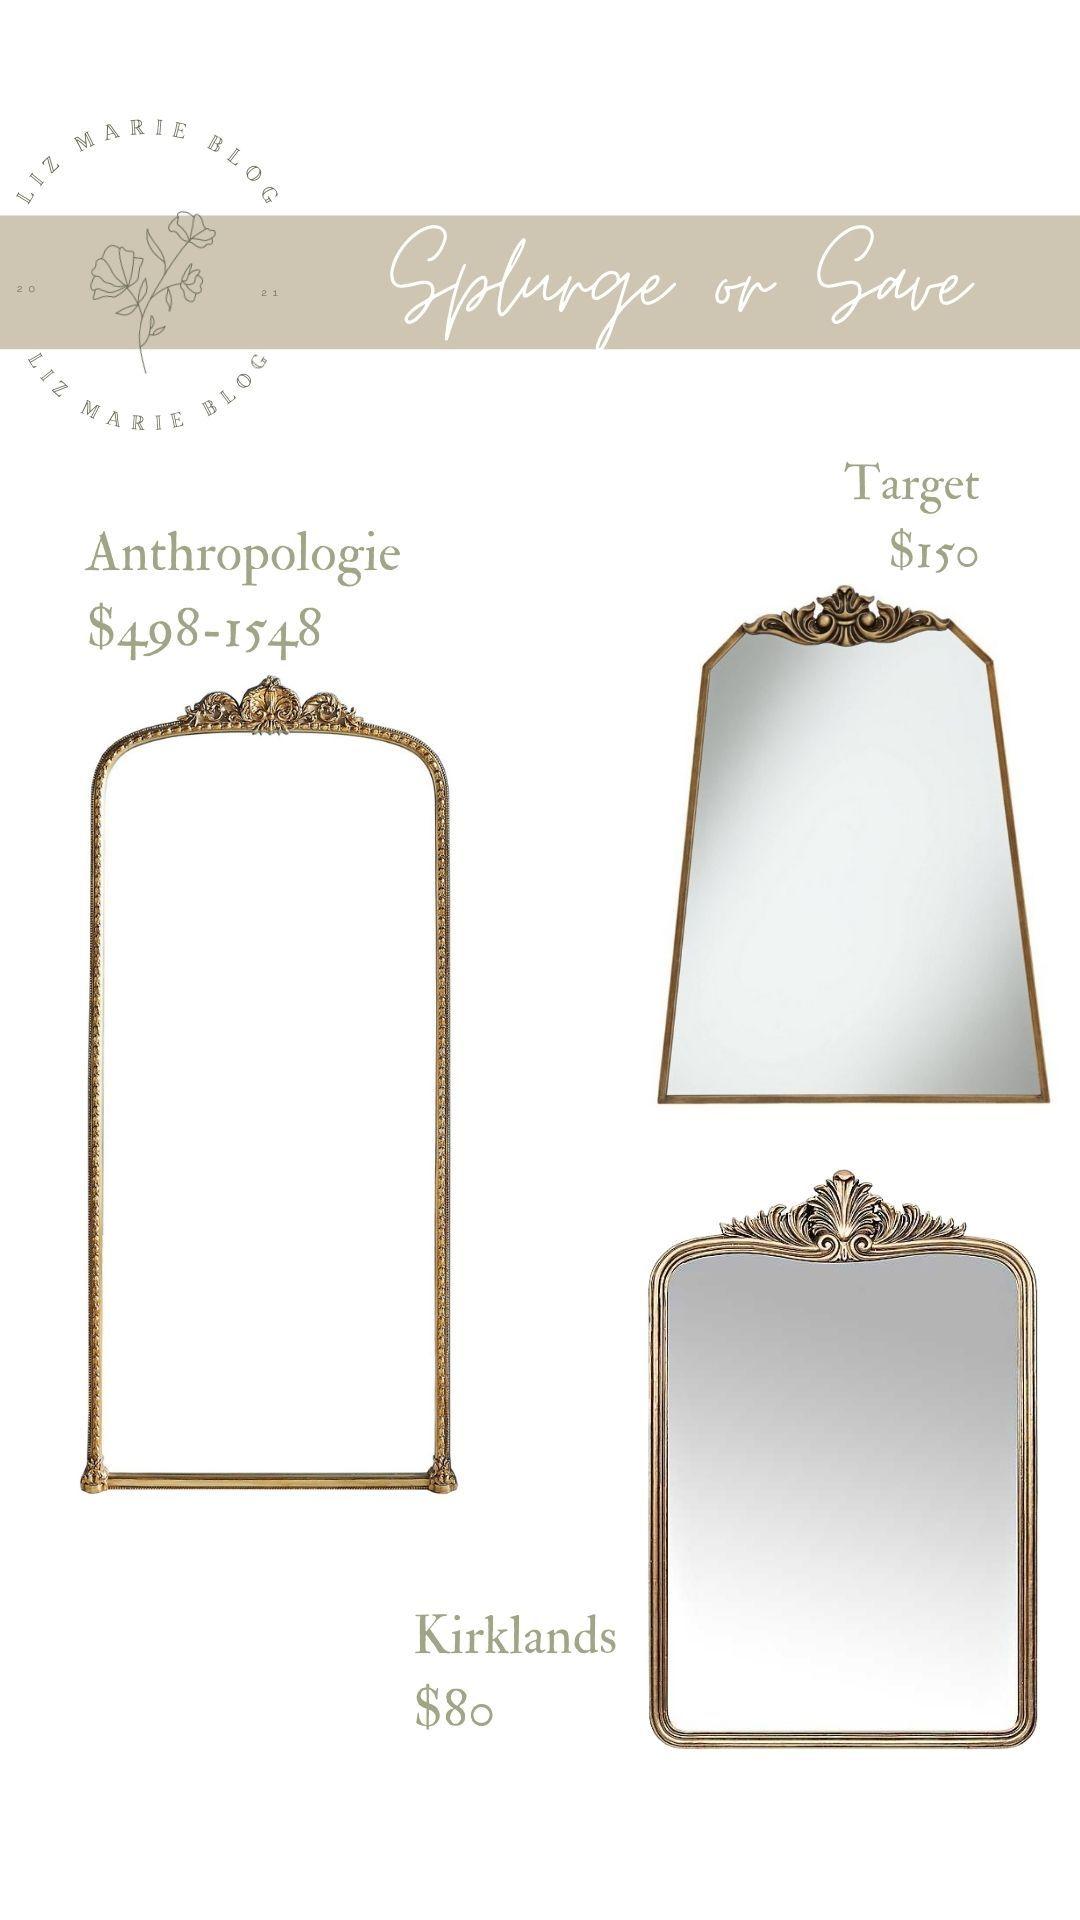 Gold Mirrors Splurge Or Save Anthro Mirror Dupes In 2021 Bedroom Decor Lights Mirror Splurge